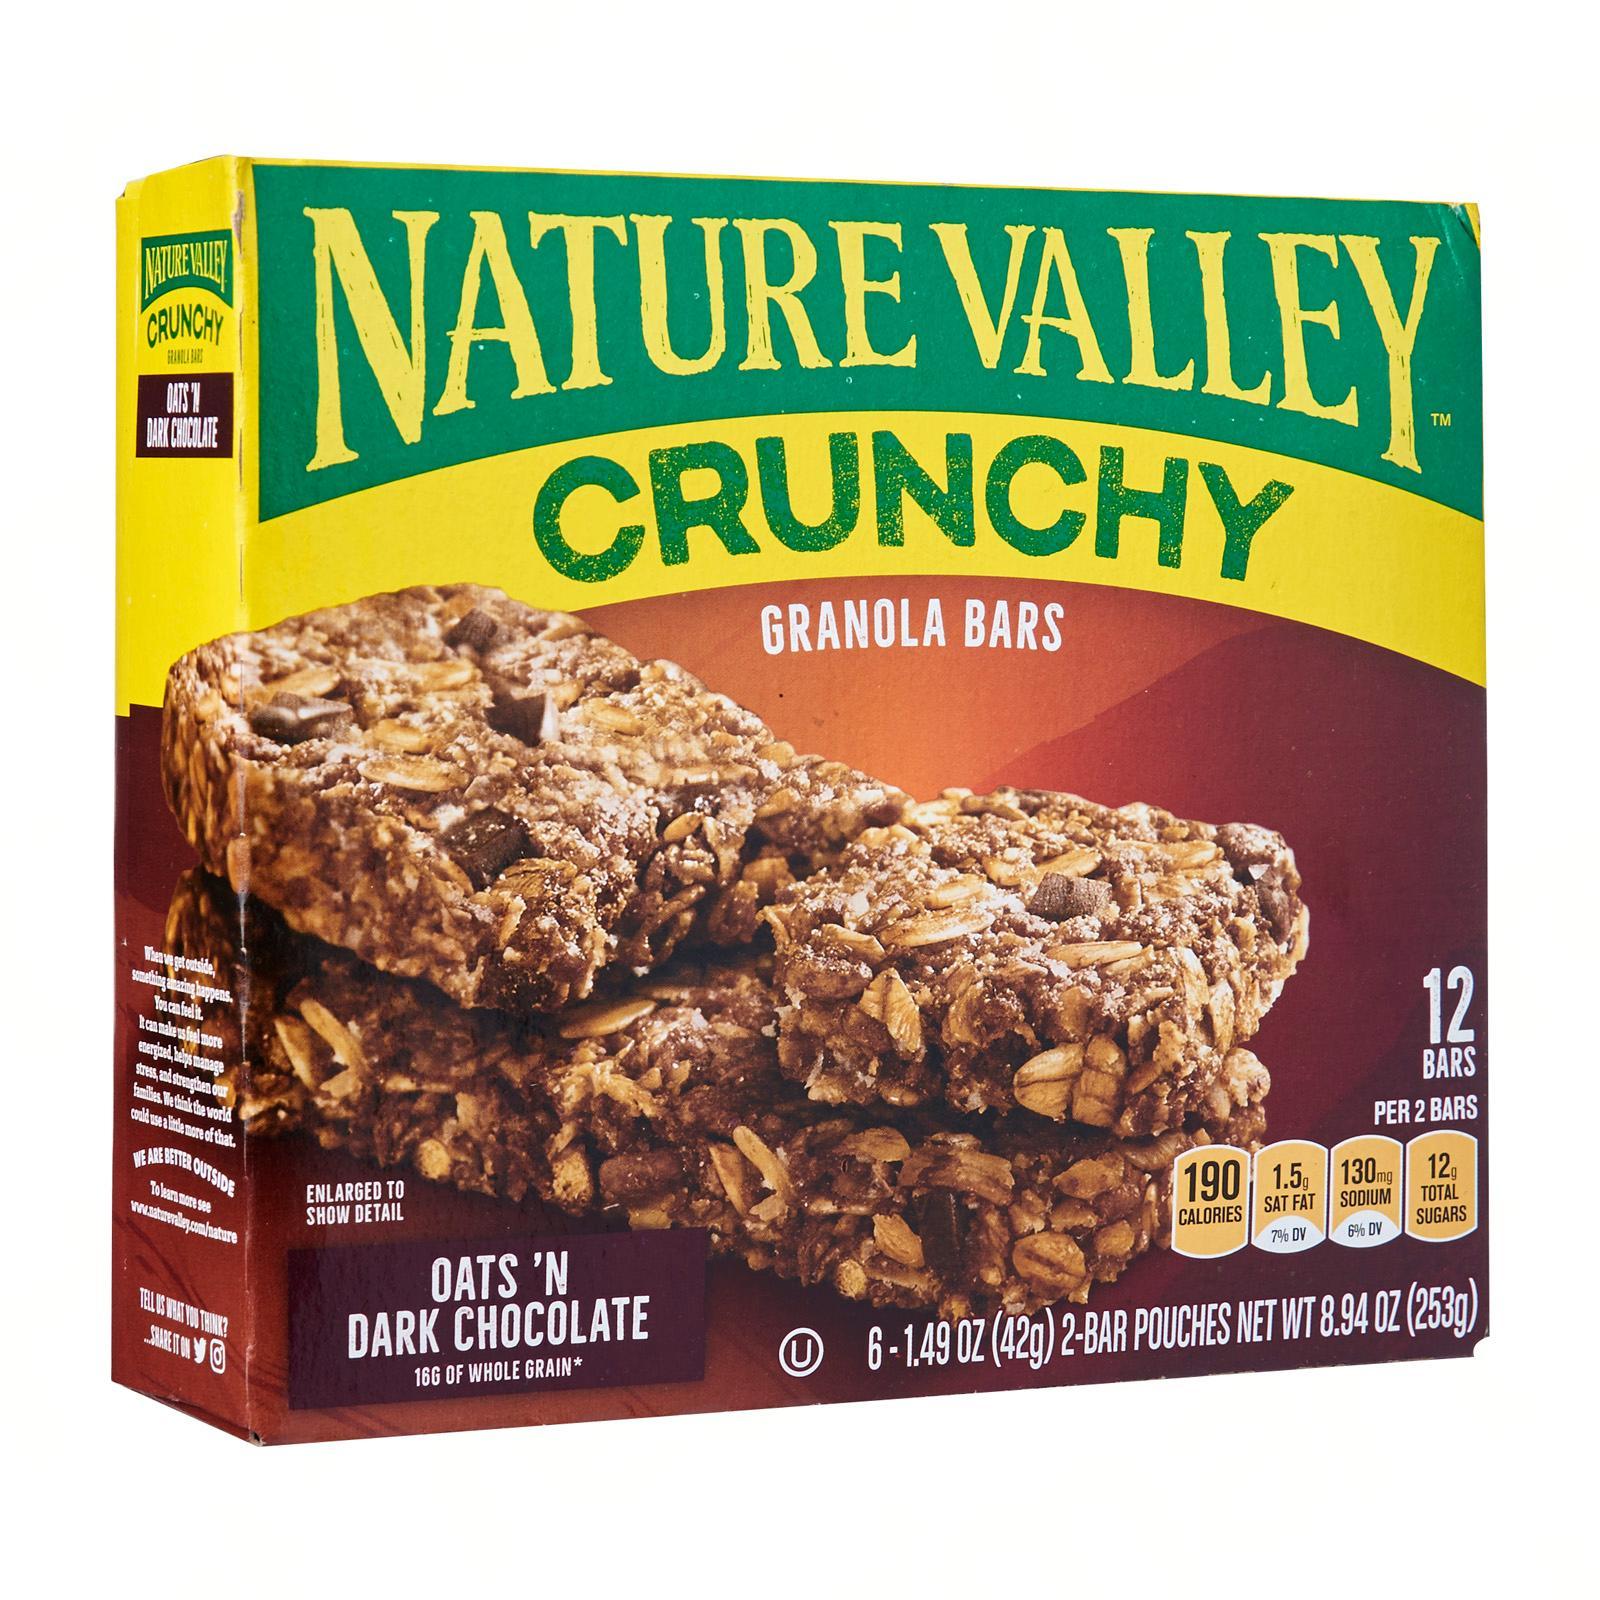 Nature Valley Oats and Dark Chocolate Granola Bars